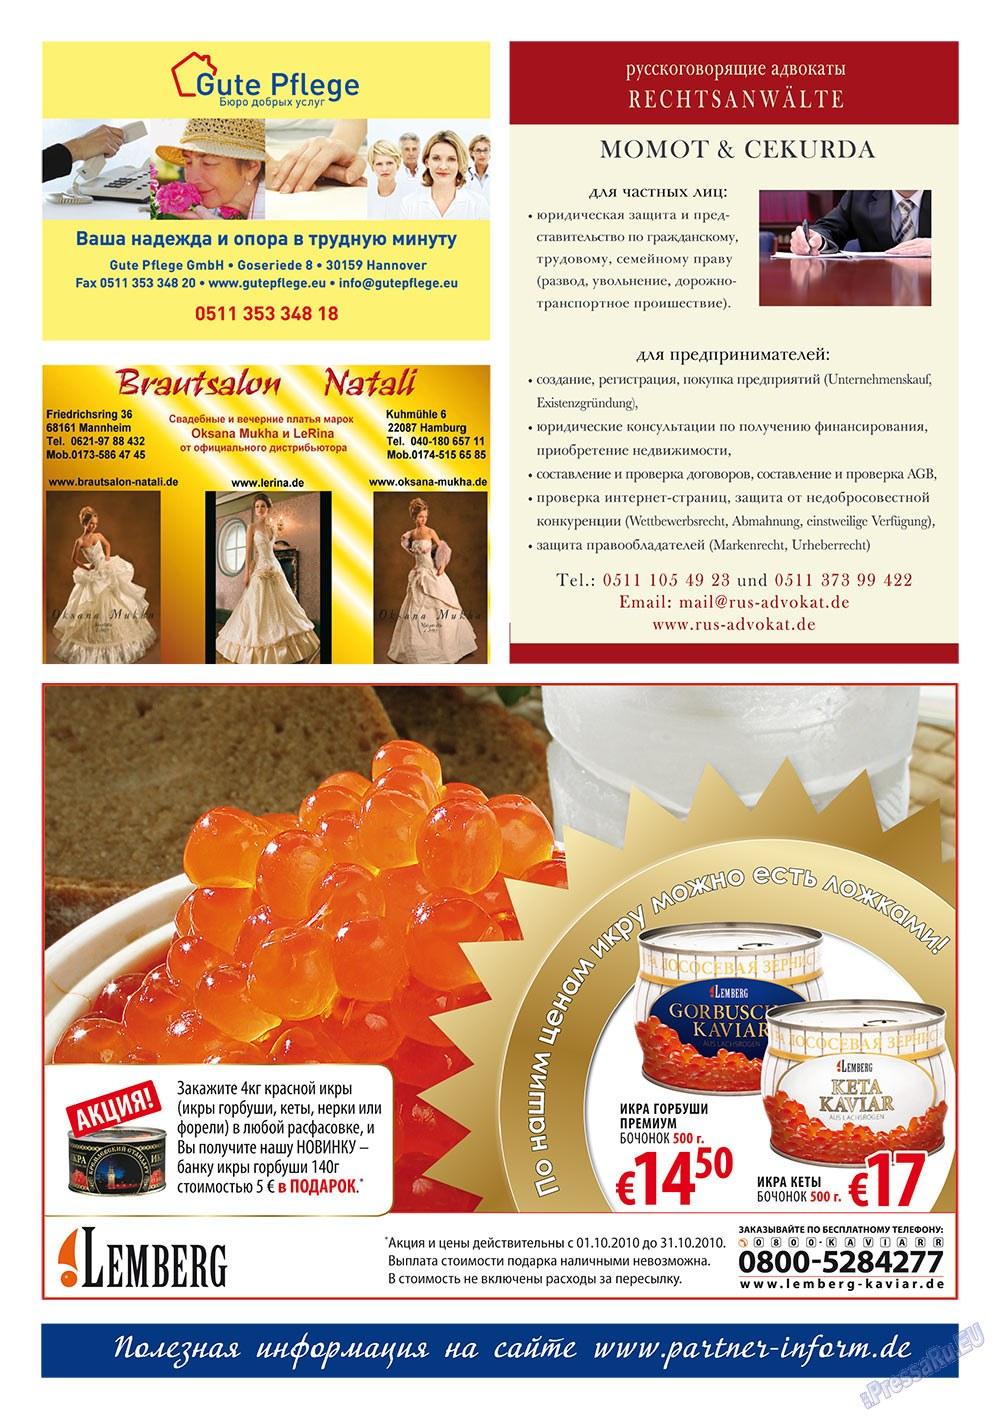 Партнер-север (журнал). 2010 год, номер 10, стр. 2